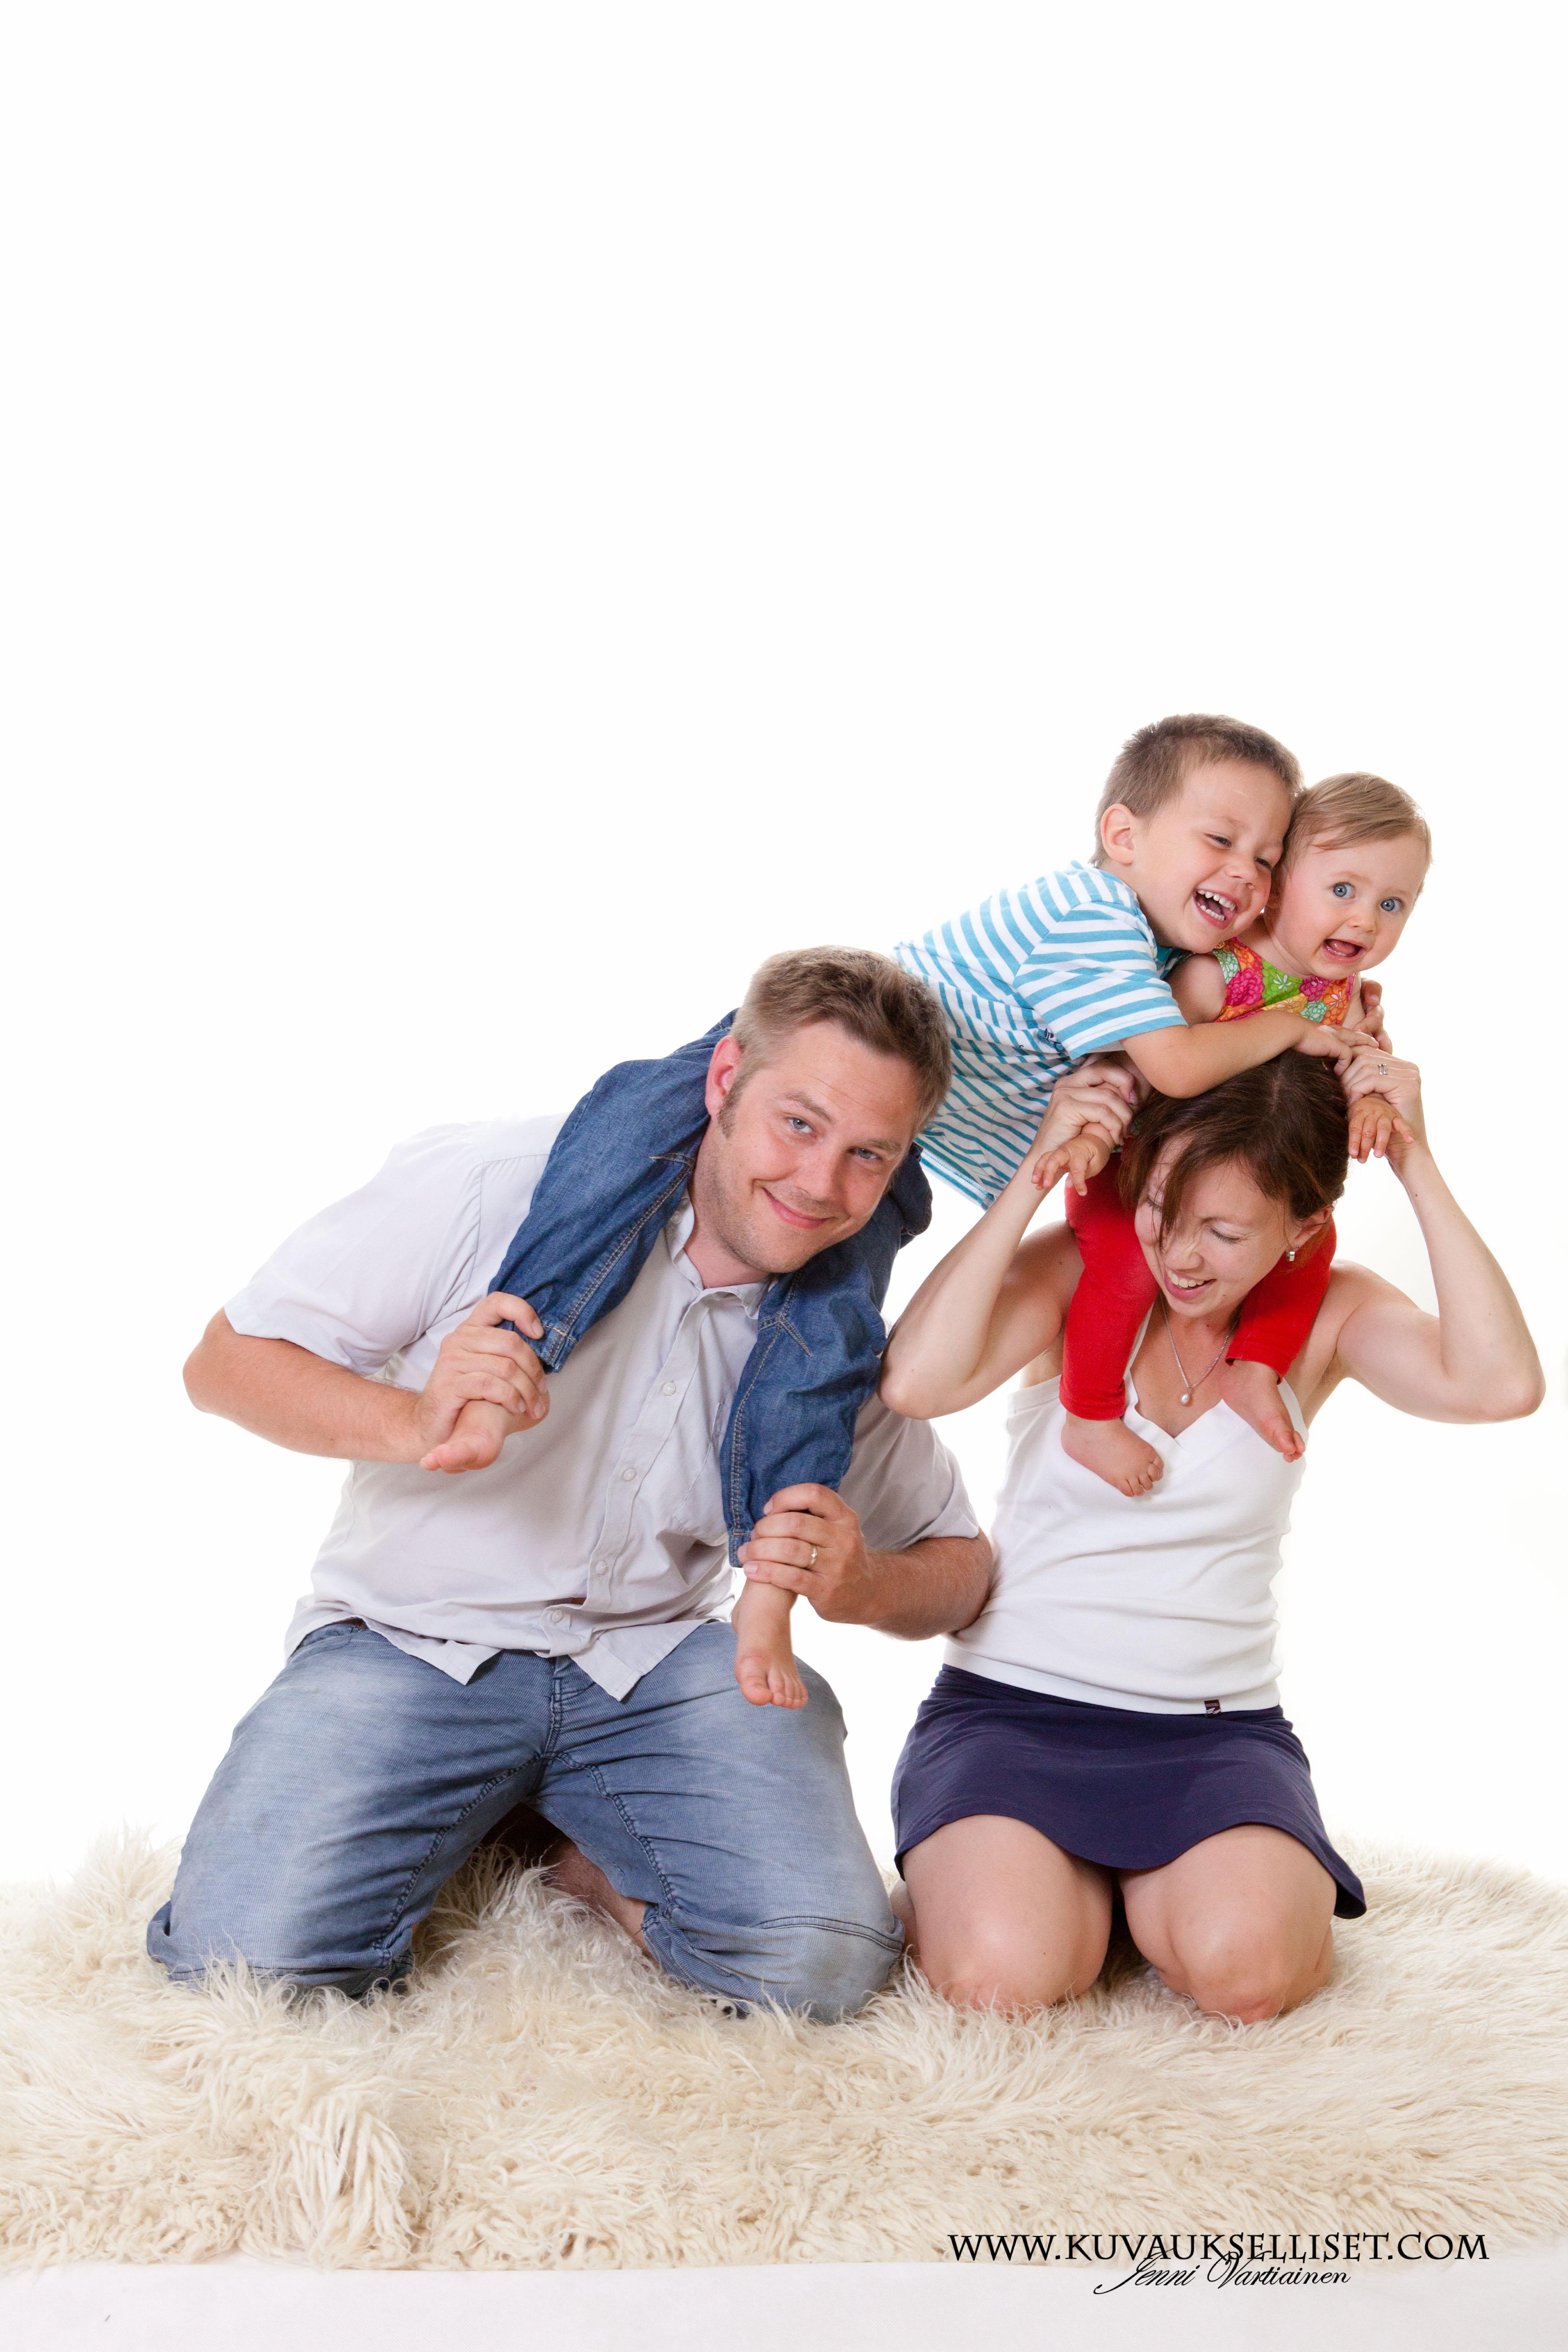 2014.8.13 lapsikuvaus miljöökuvaus perhekuvaus 1-vuotiskuvaus family pictures child photo (5 of 6)